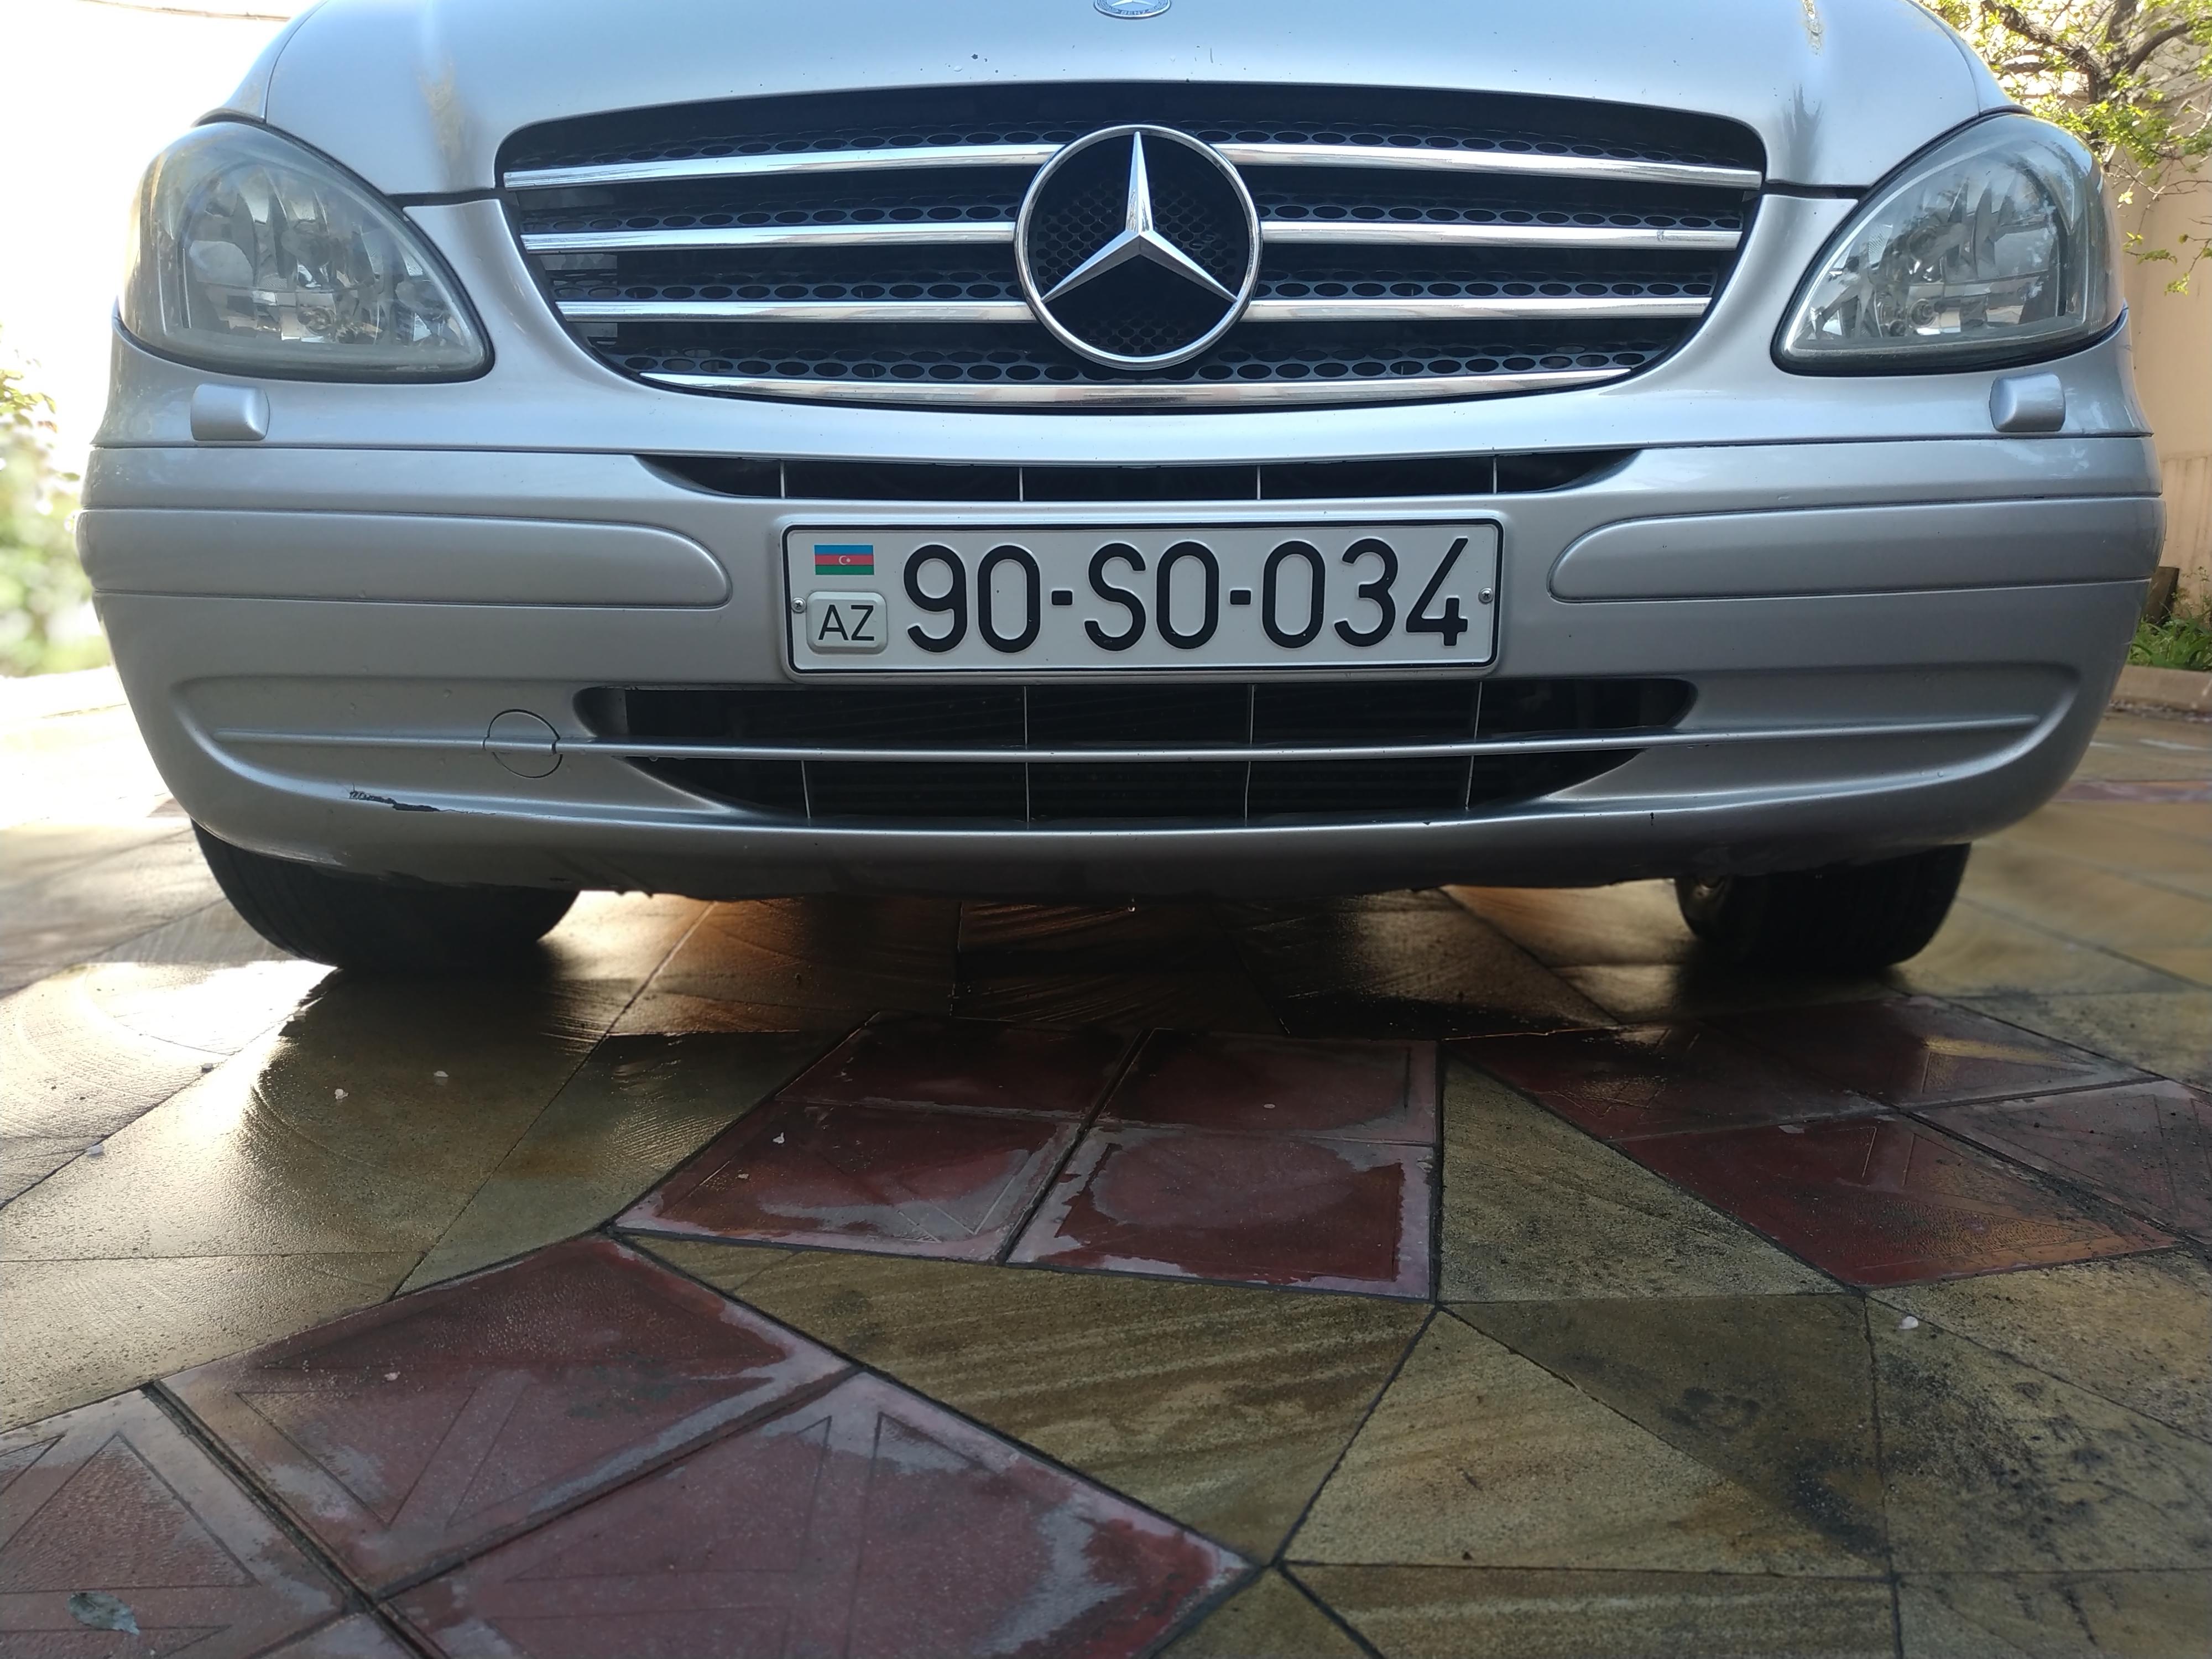 Mercedes-Benz Viano 2.2(lt) 2006 İkinci əl  $16000